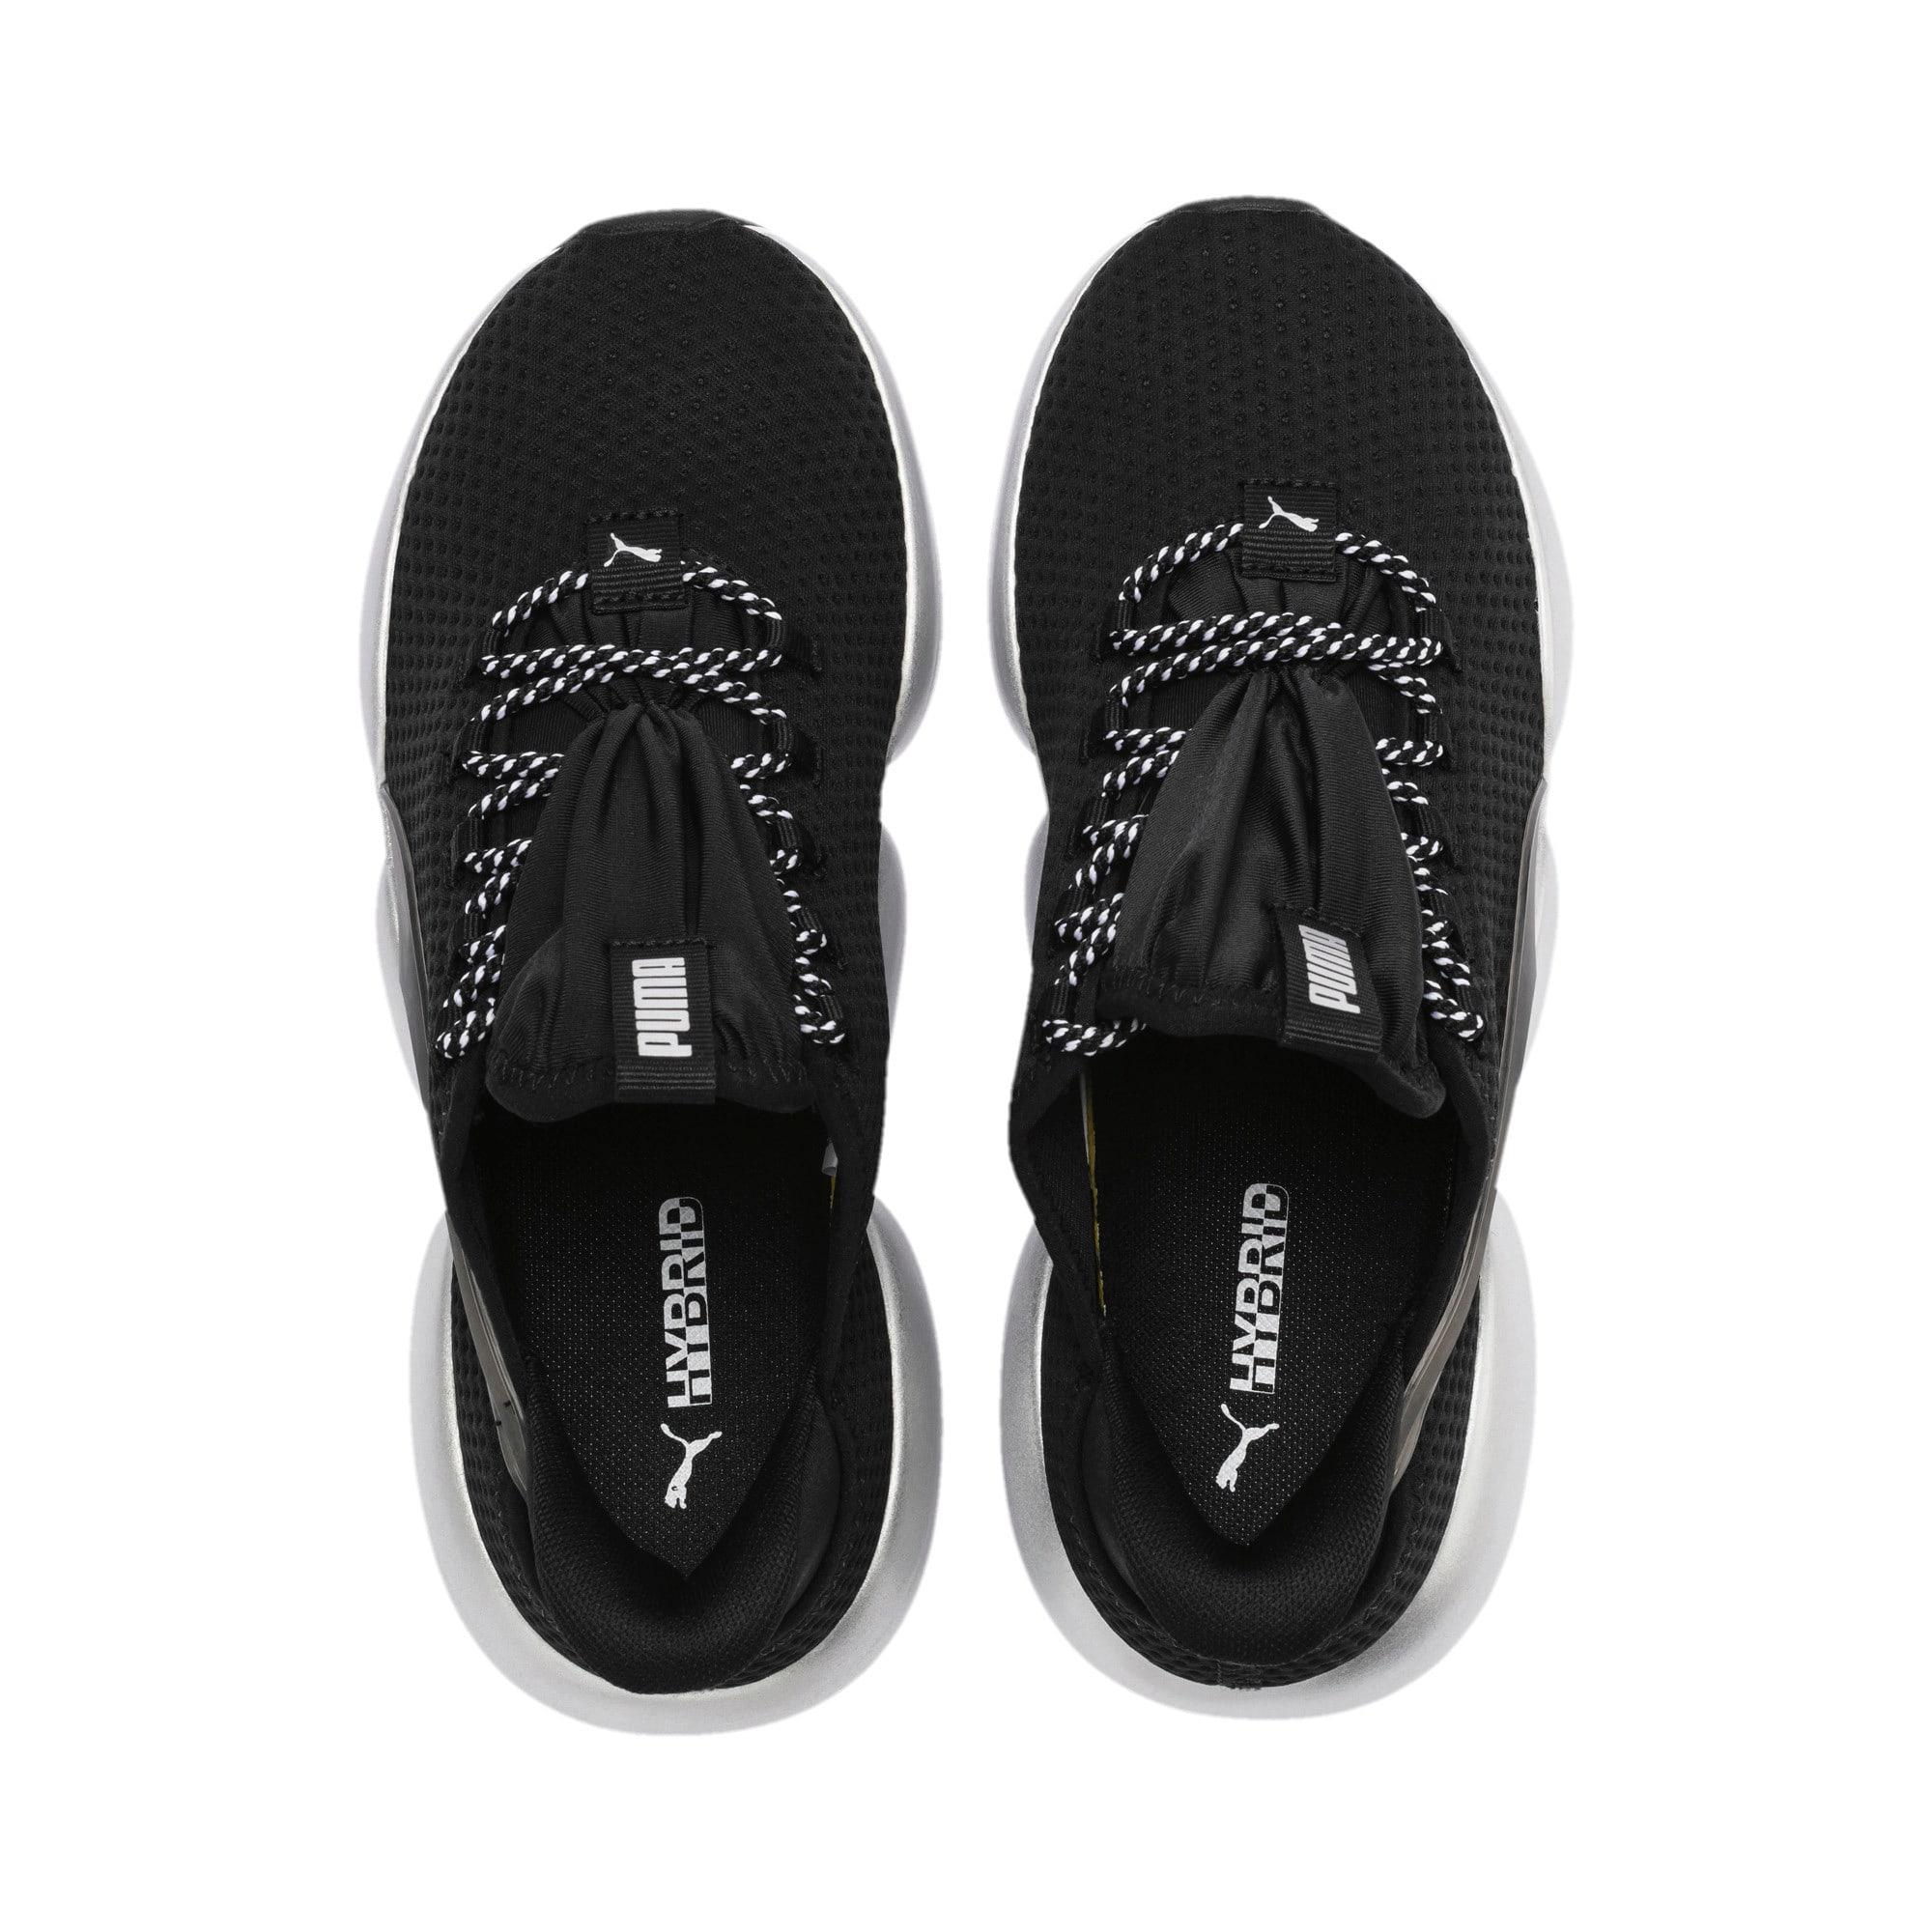 Thumbnail 7 of Mode XT Women's Training Shoes, Puma Black-Puma White, medium